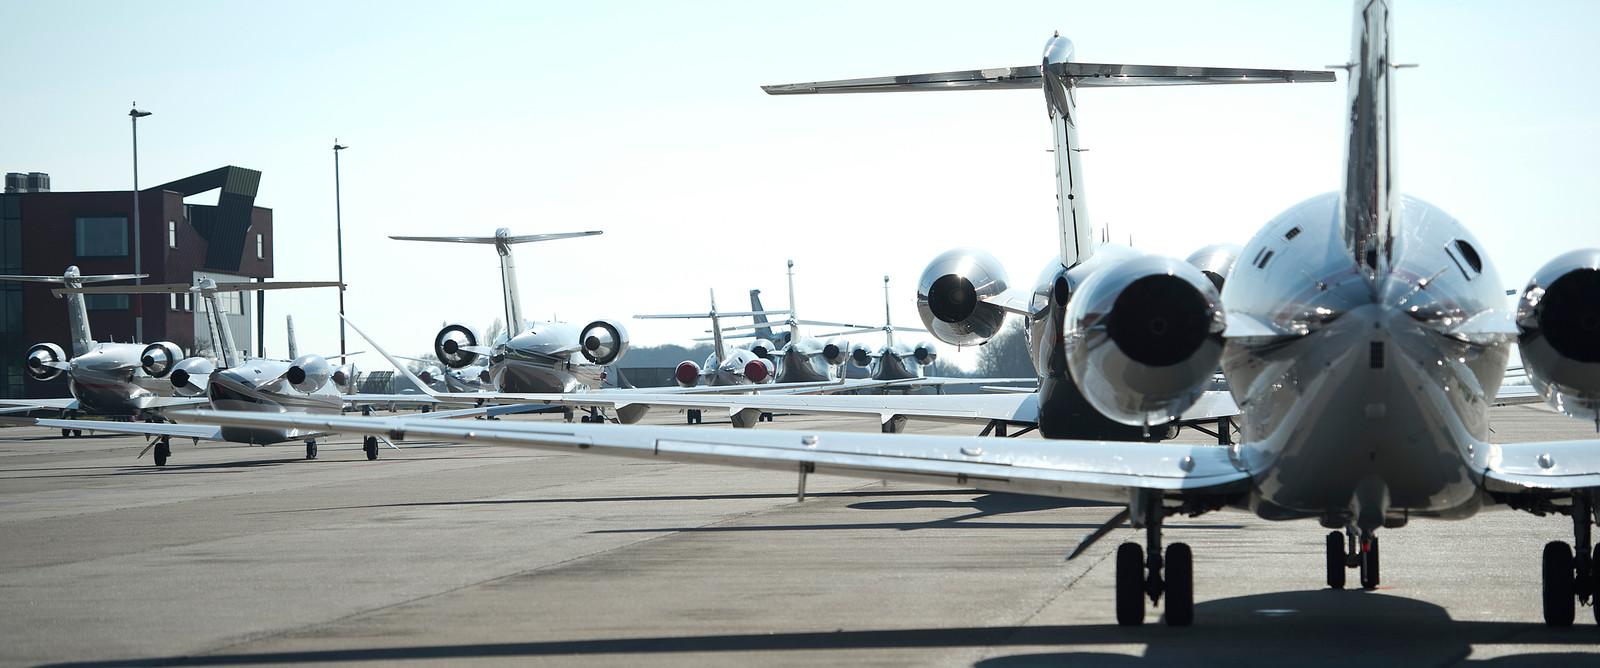 Vliegtuigen op vliegveld Maastricht Aachen Airport.